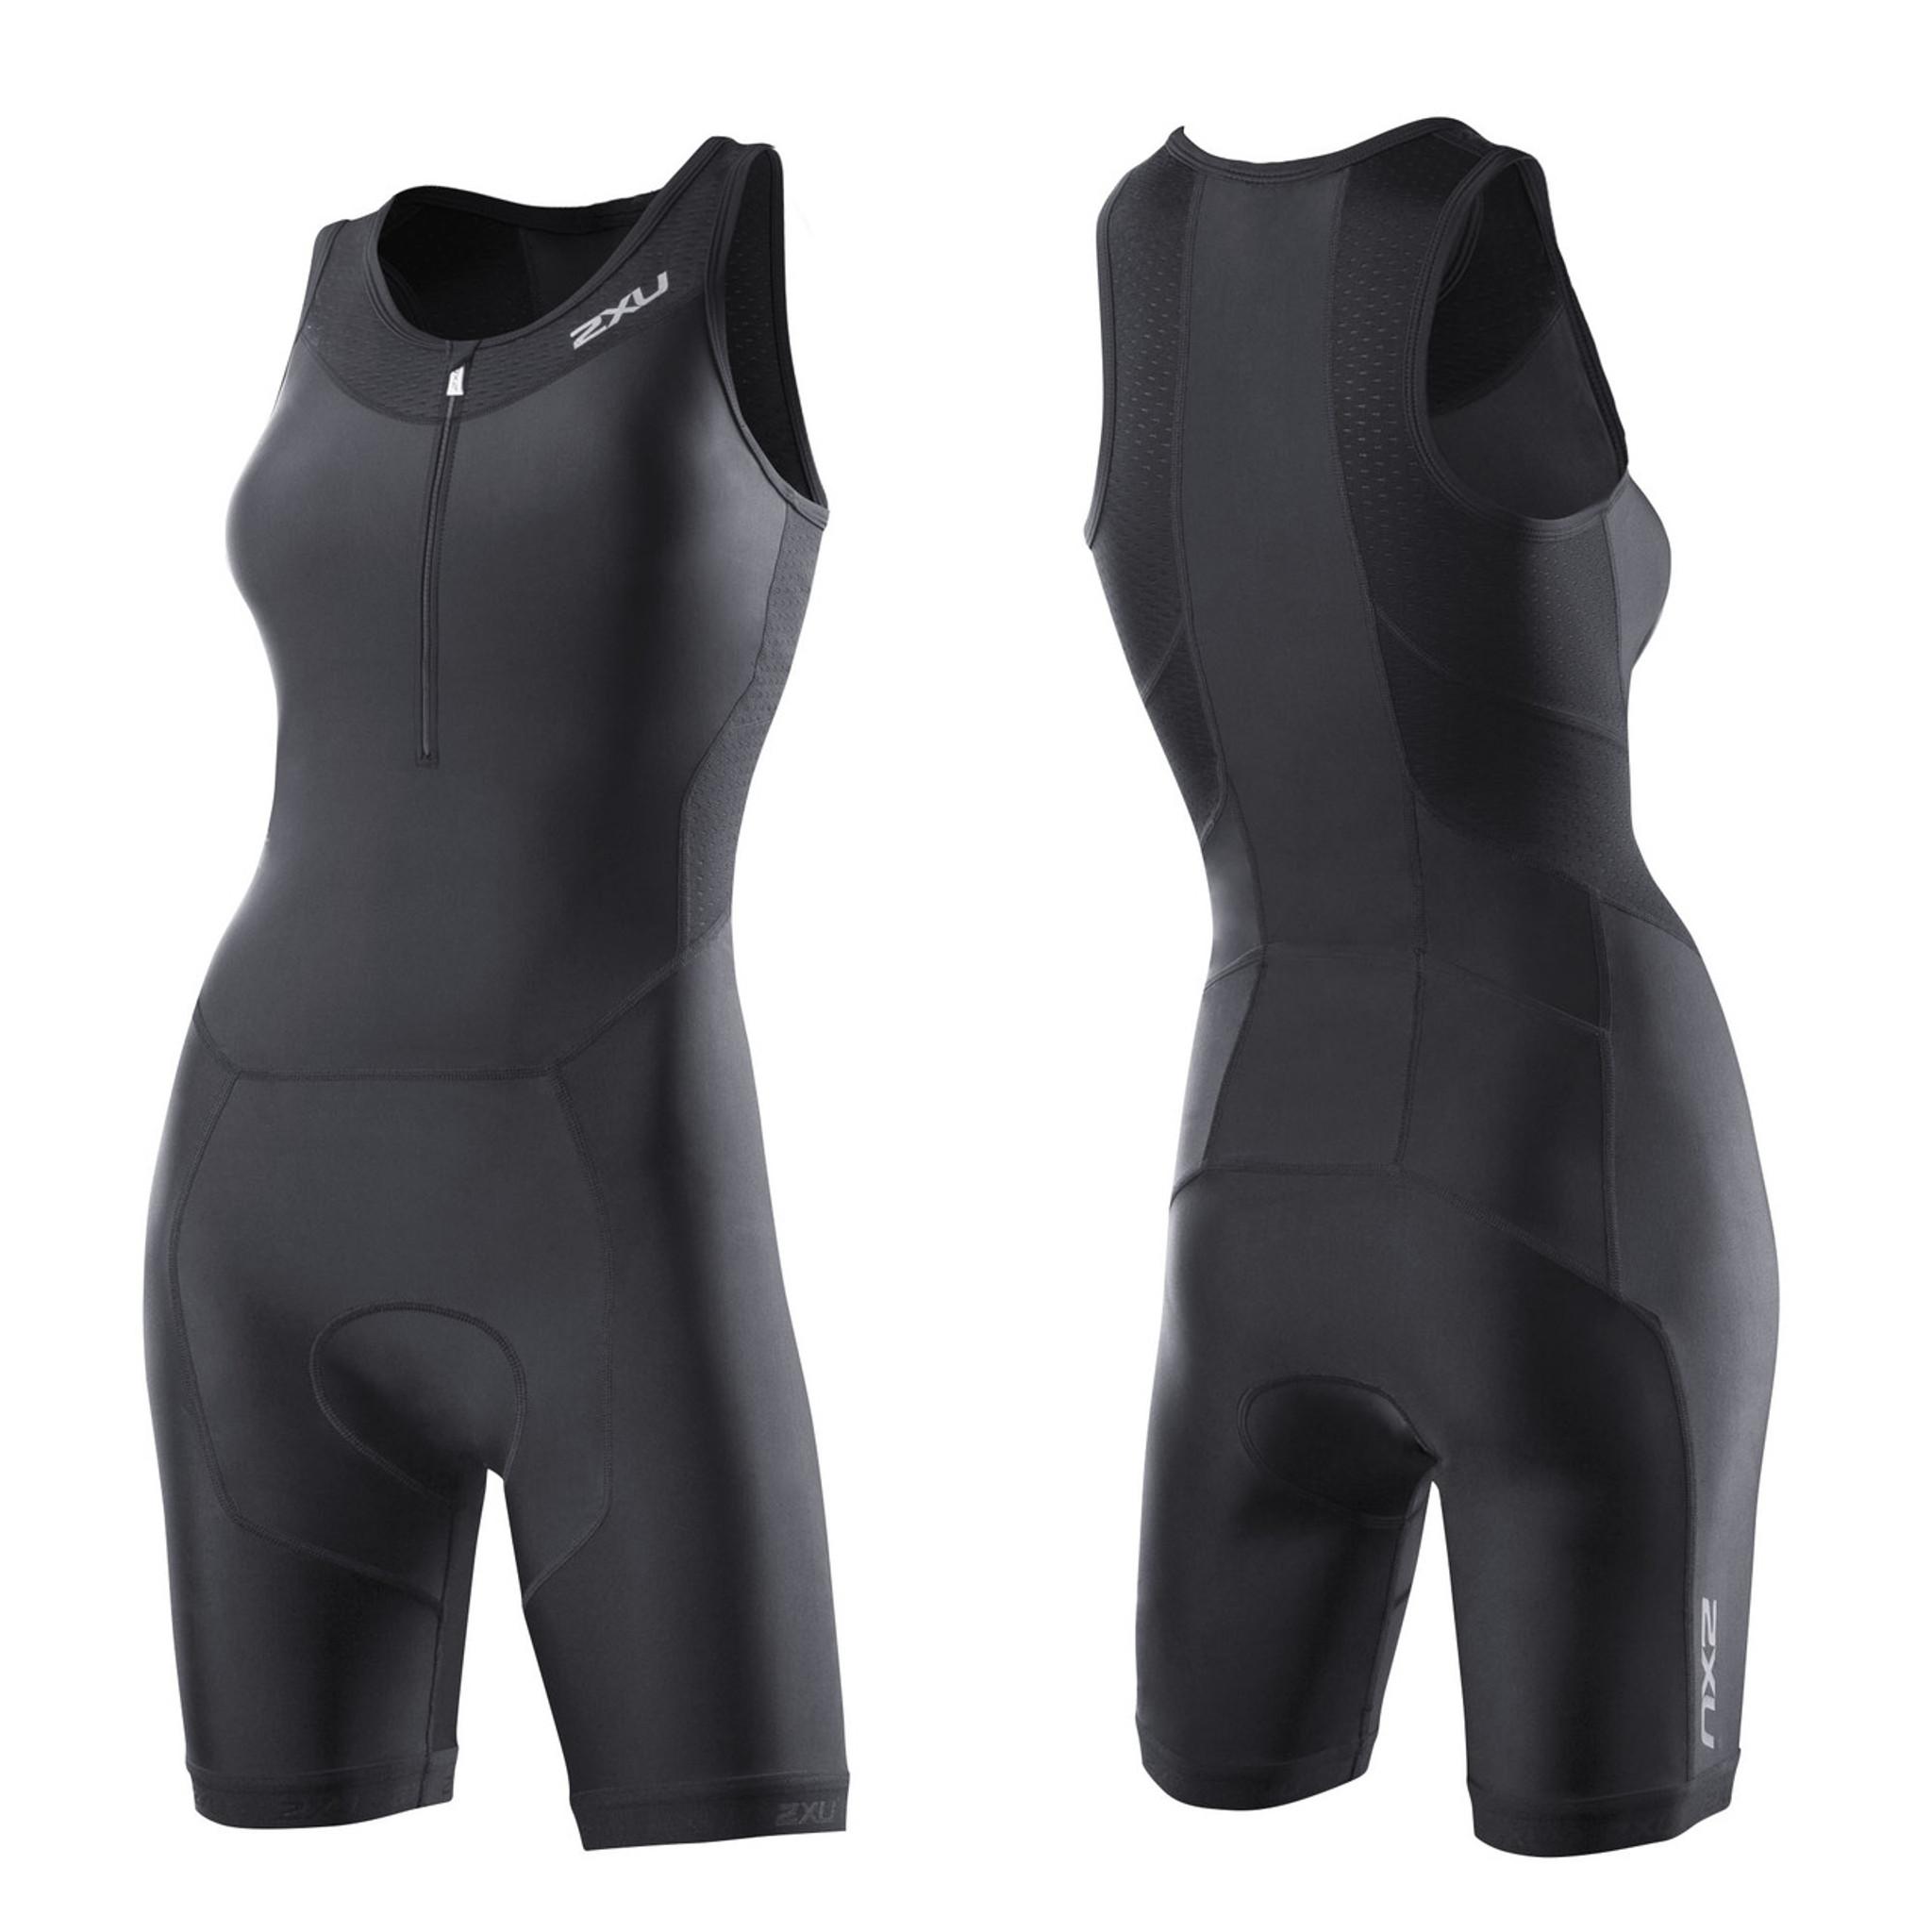 e06b9379 2XU Women's Perform Trisuit -Black, Black/ Synthetic Pink, Charcoal/ Astro  Green, Charcoal/ Ultramarine Blue - MyTriathlon